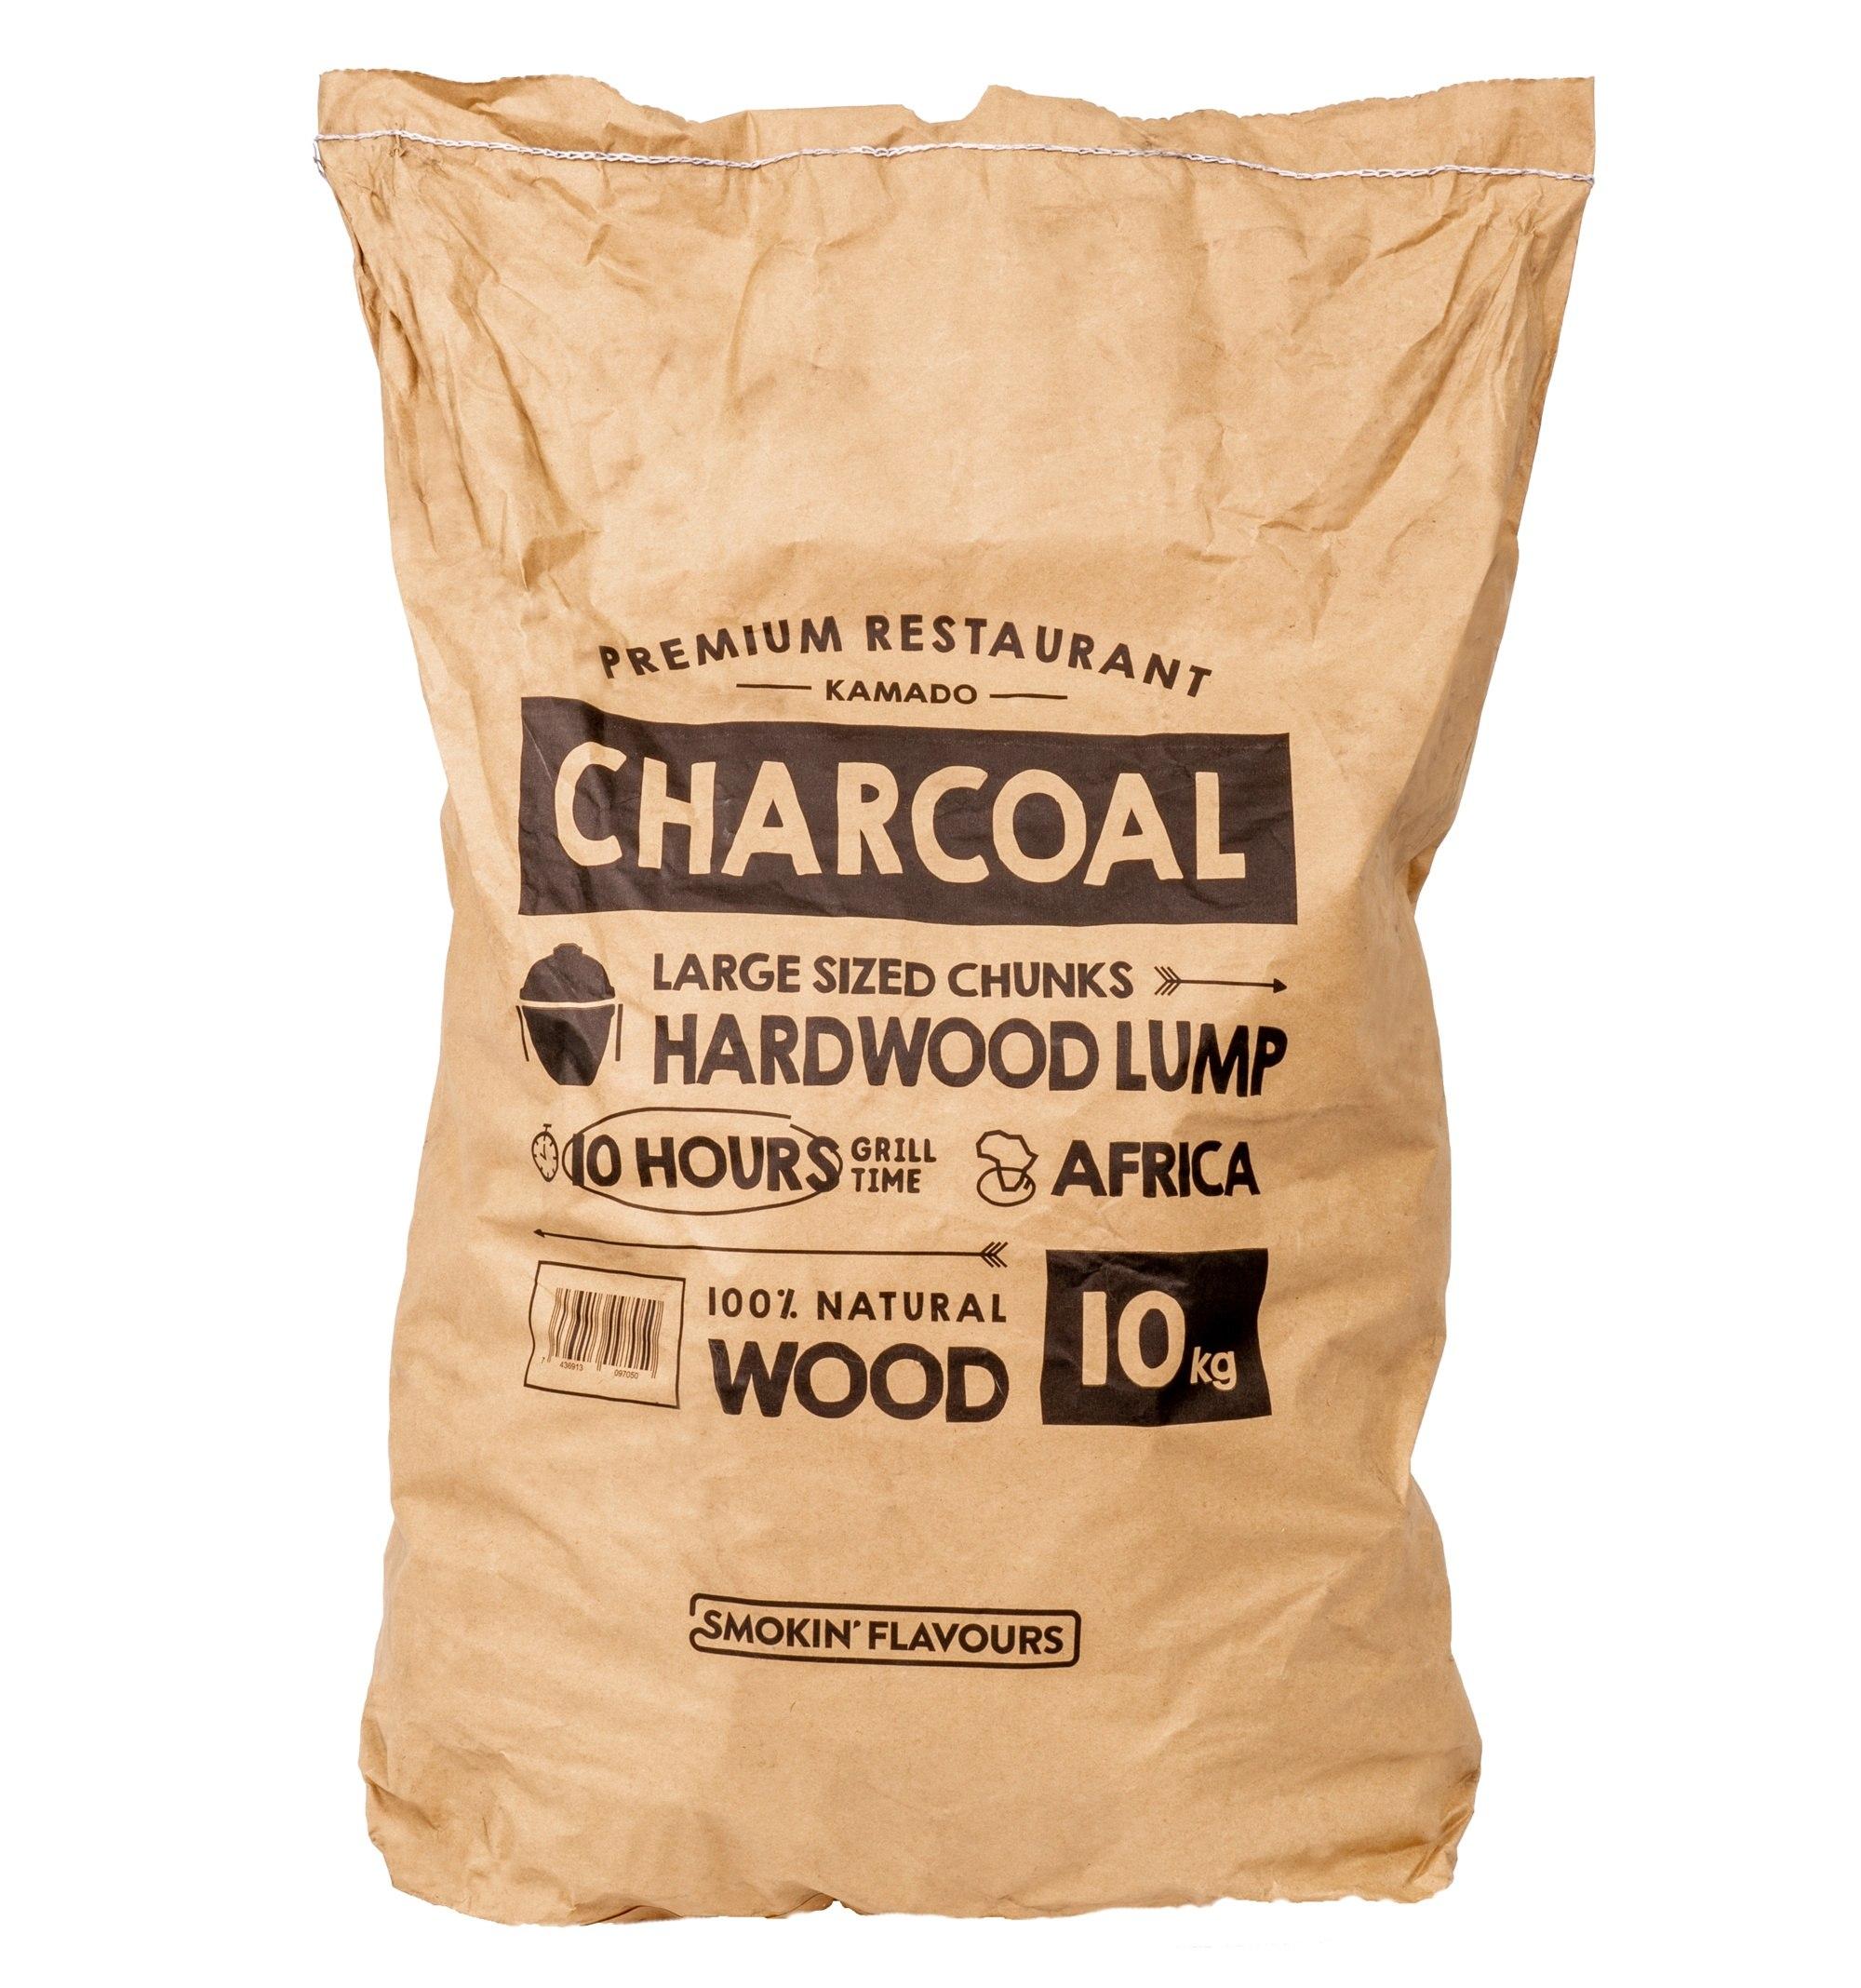 Smoking-Flavours-Houtskool-10kg